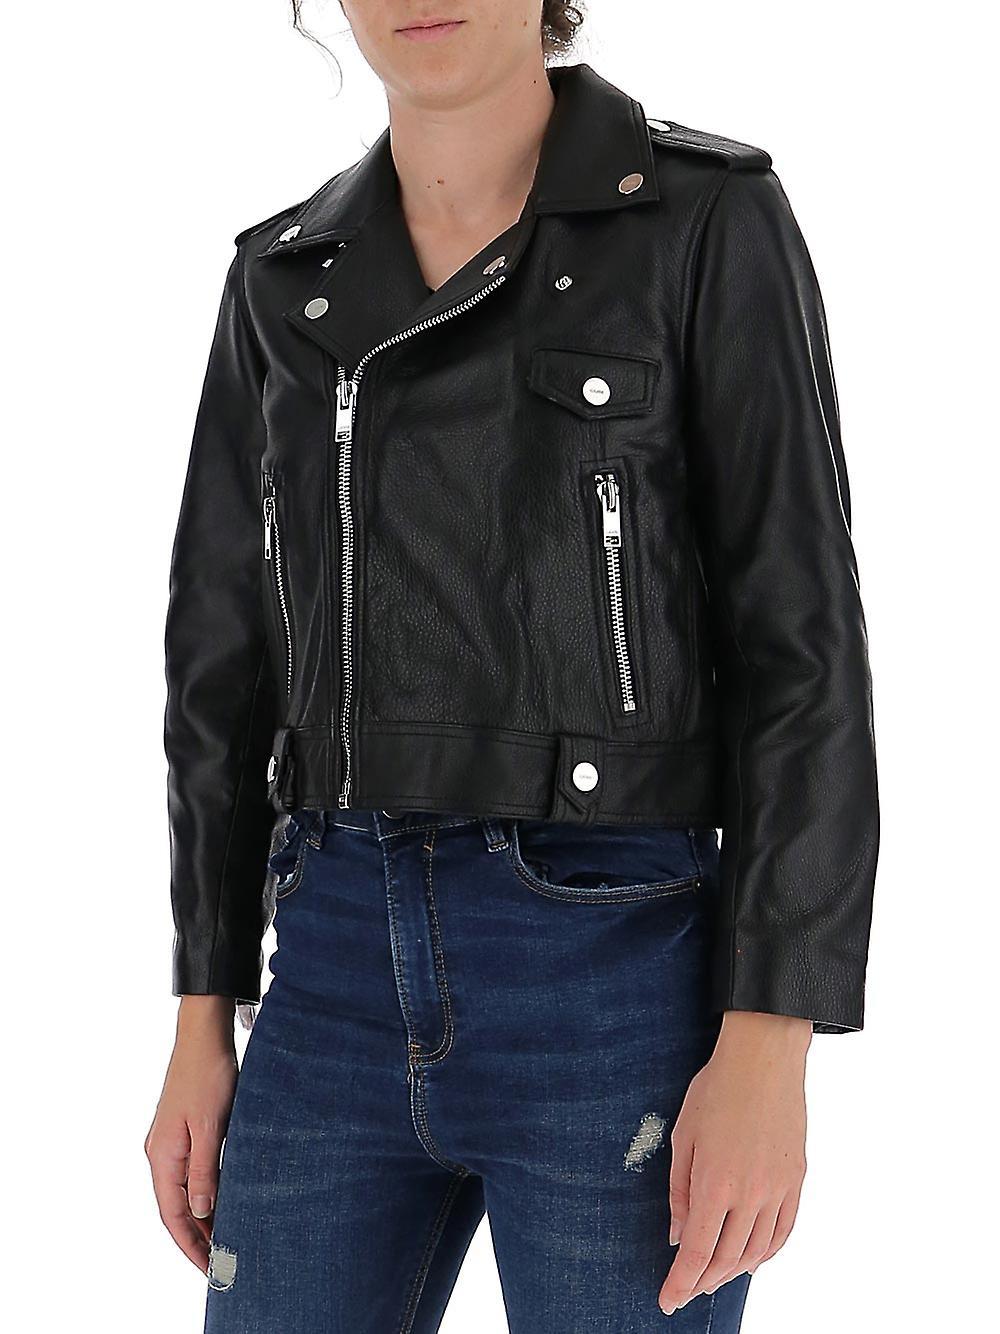 Ganni F4807099 Women's Black Leather Outerwear Jacket